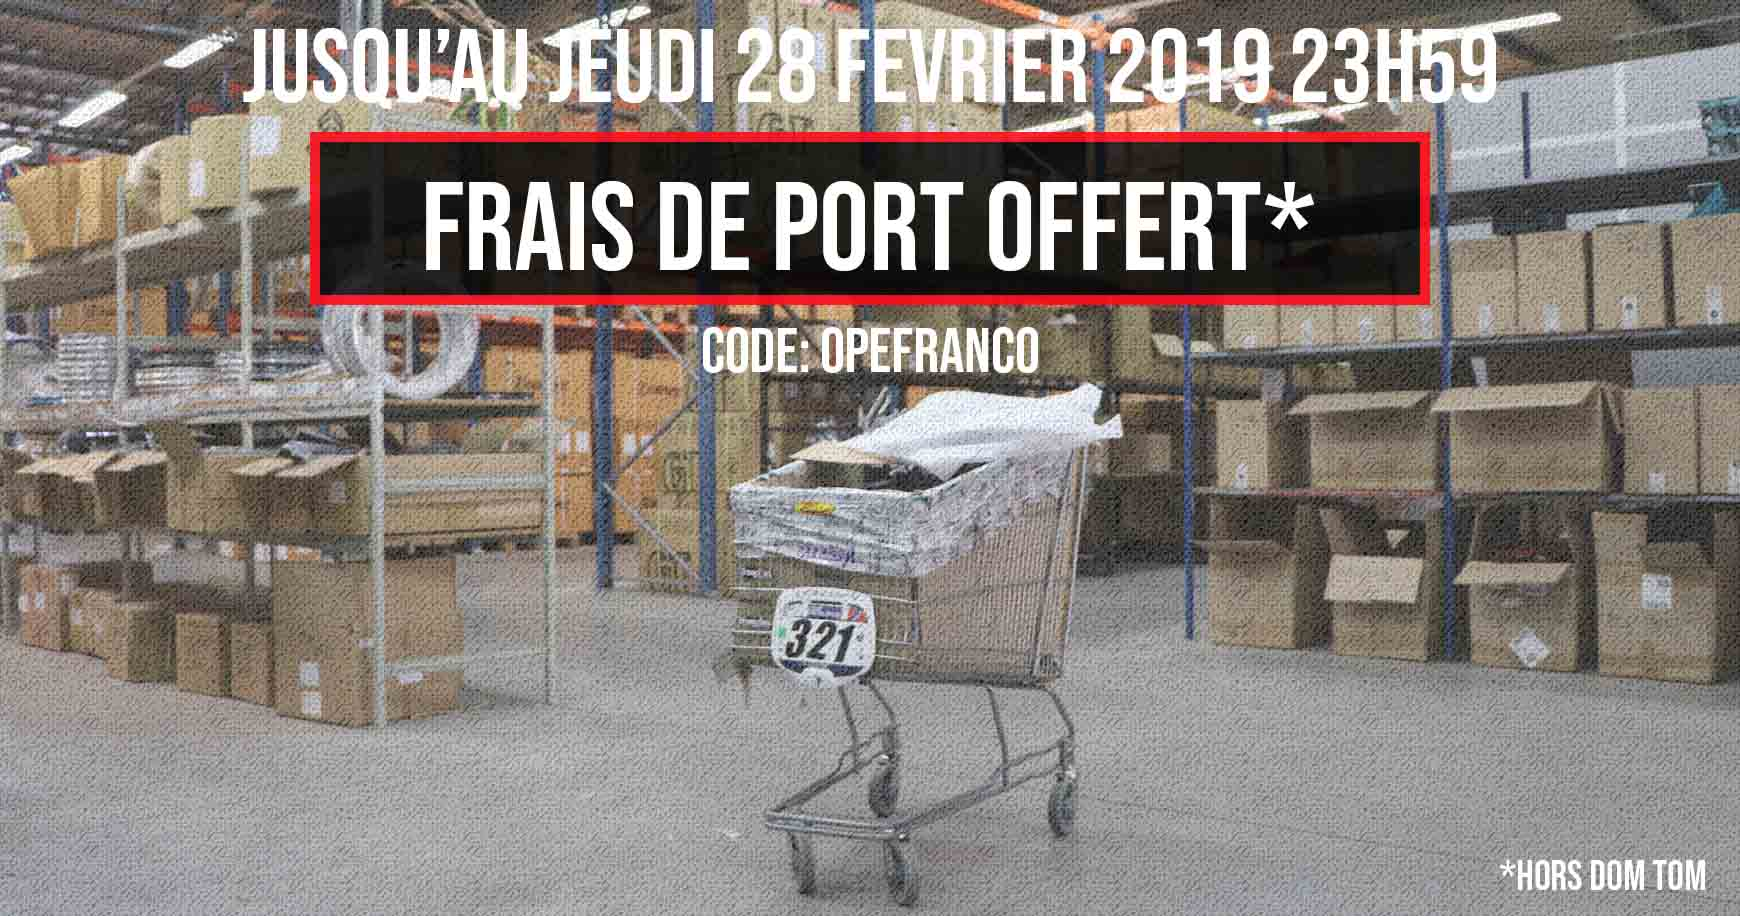 Frais de port offert frenchys distribution - Lamaloli frais de port offert ...